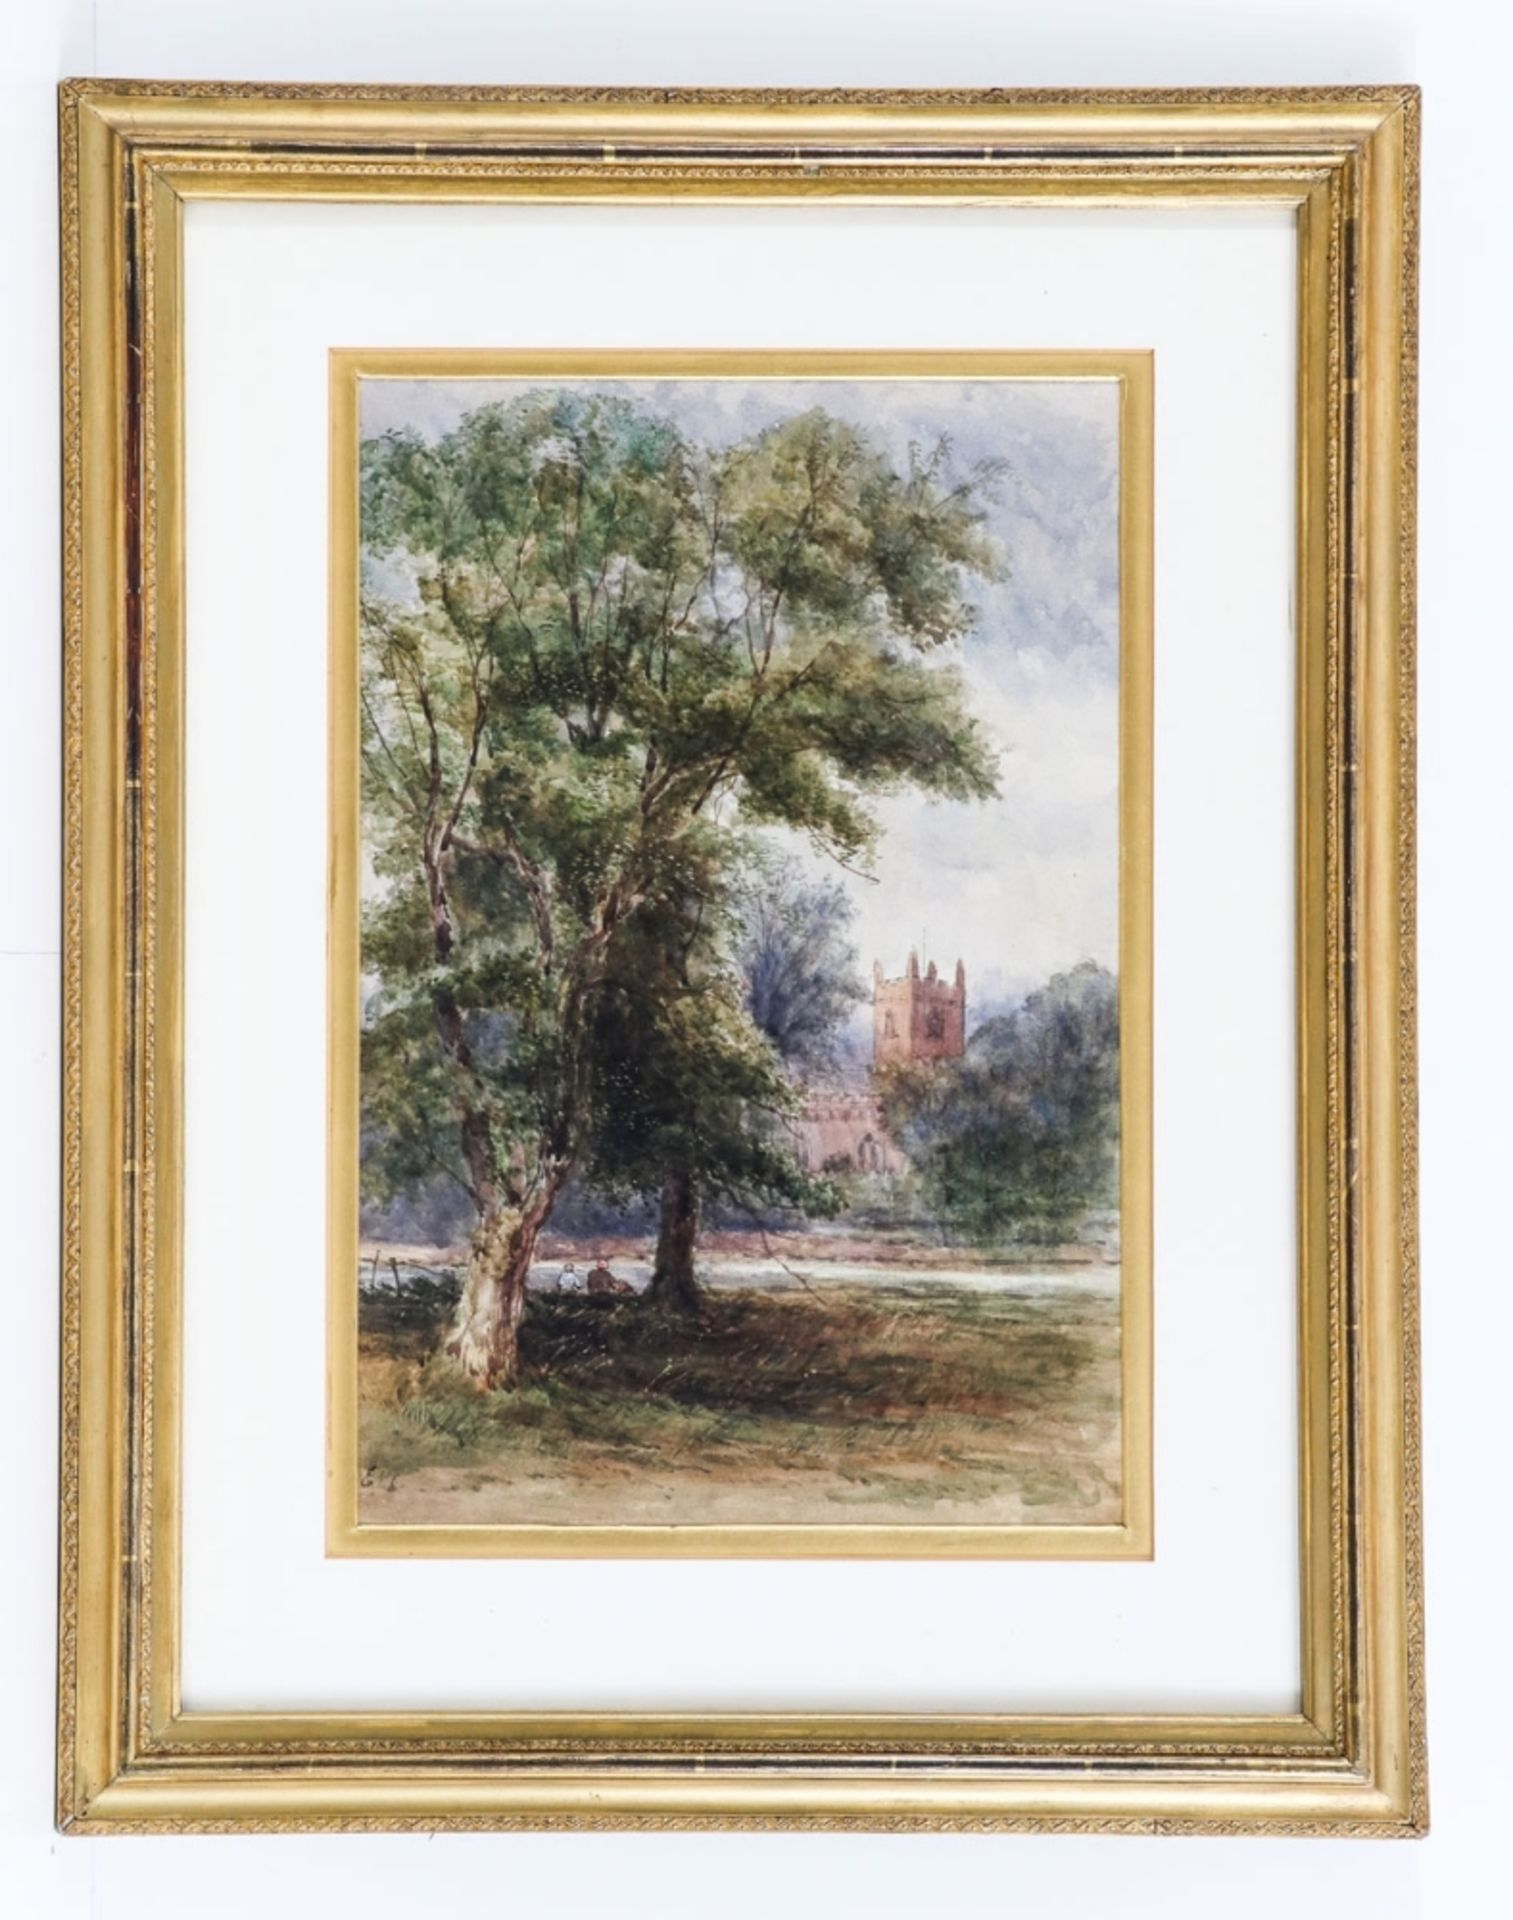 Ethel Mary Clarke - Bild 4 aus 4